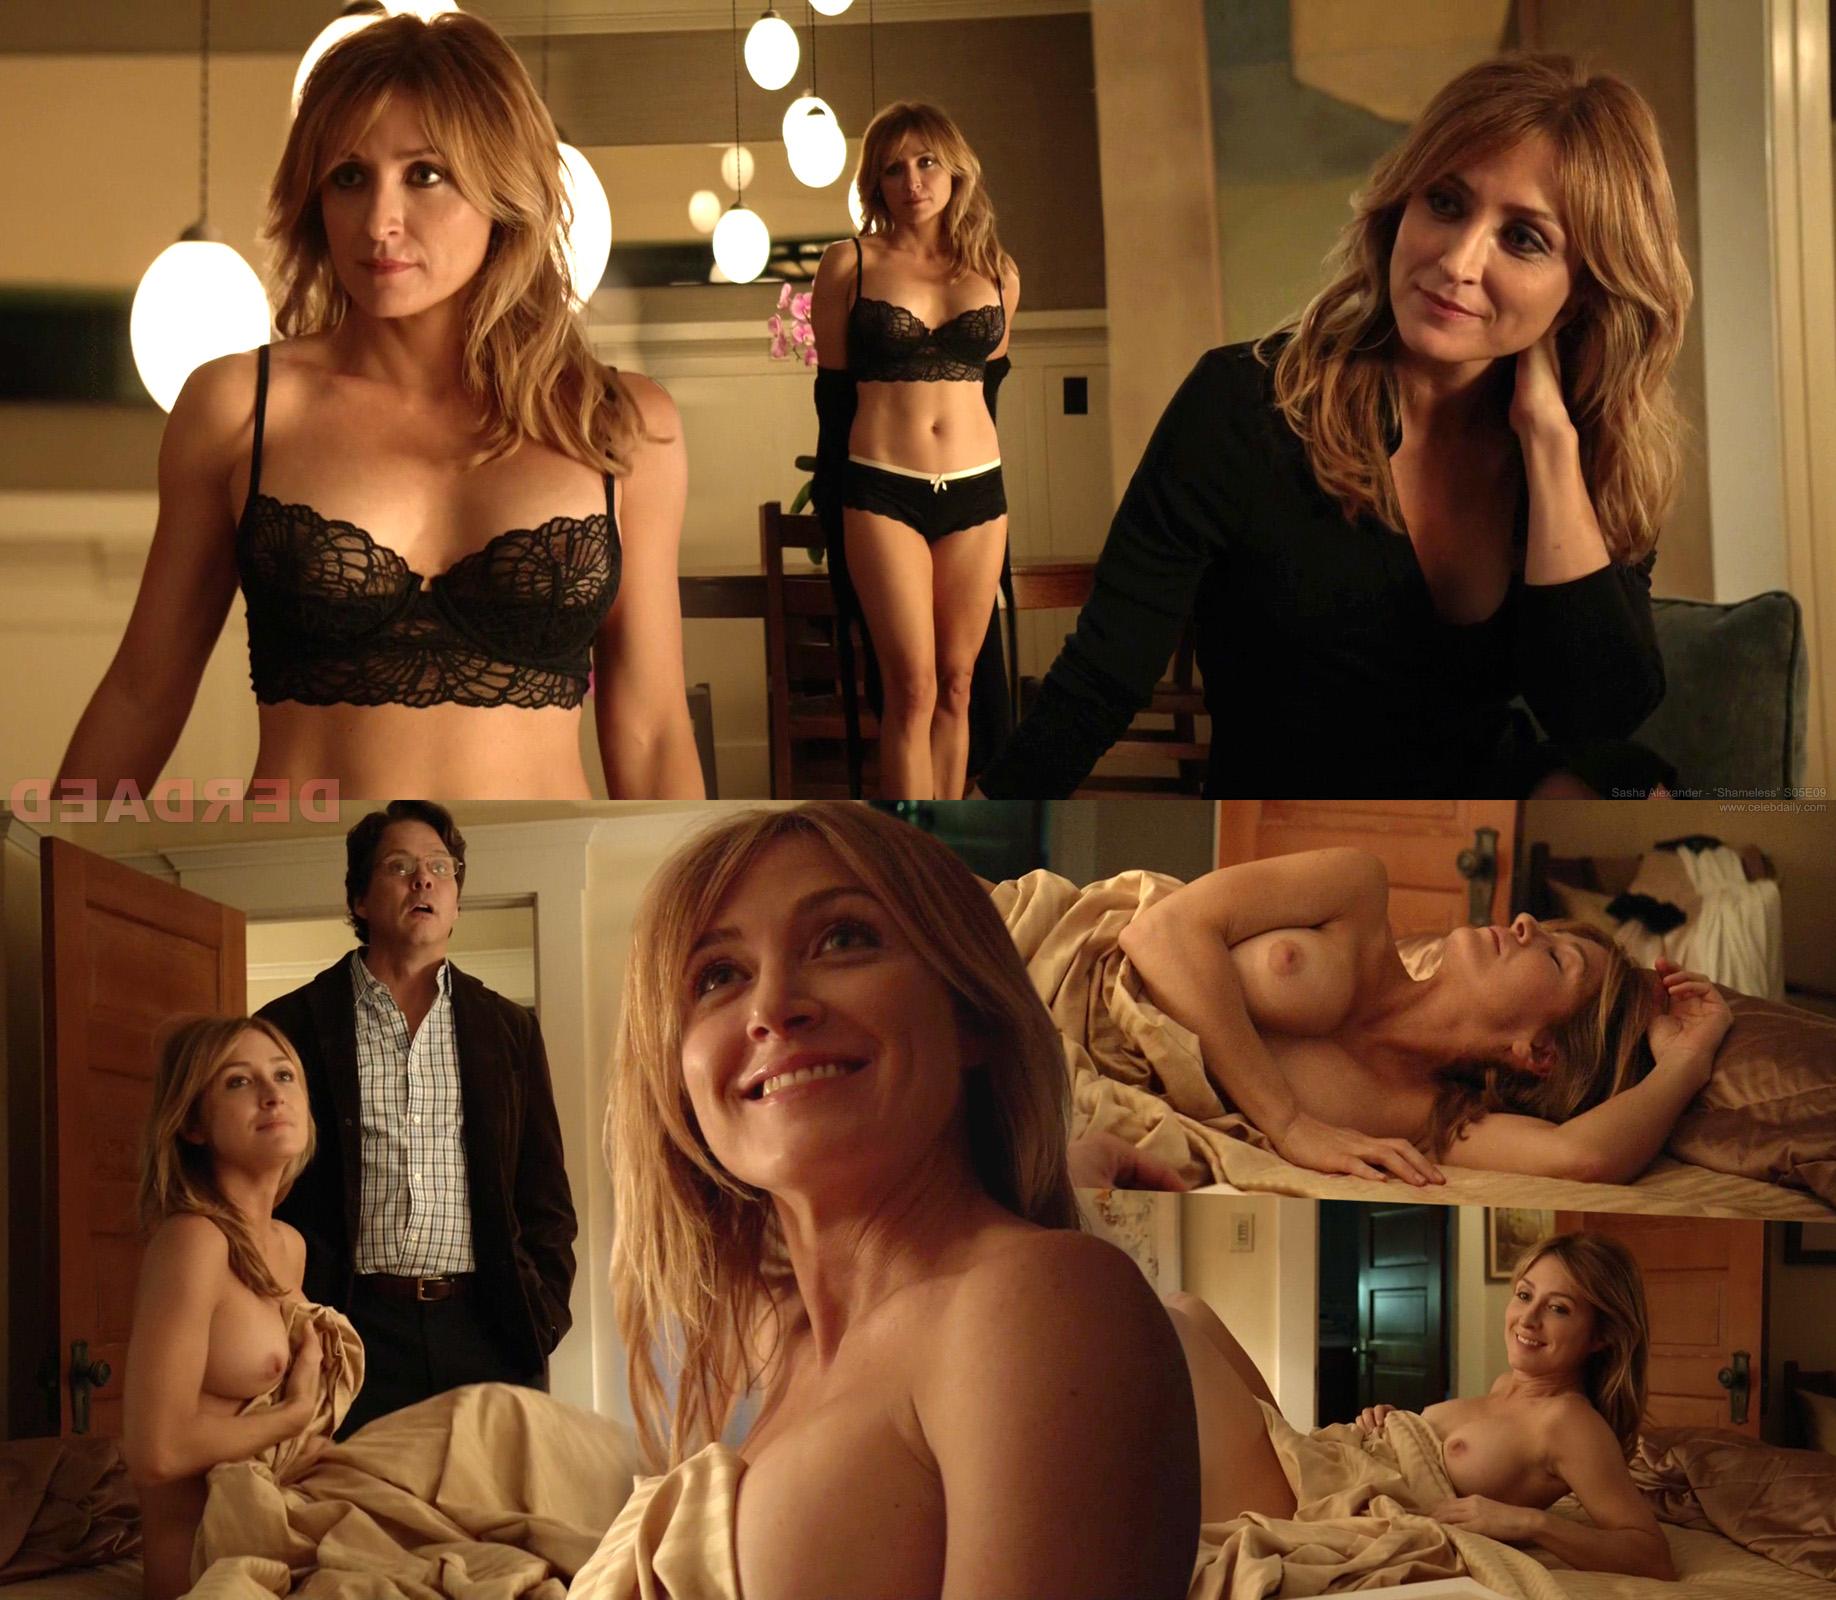 beckinsale scene Kate nude